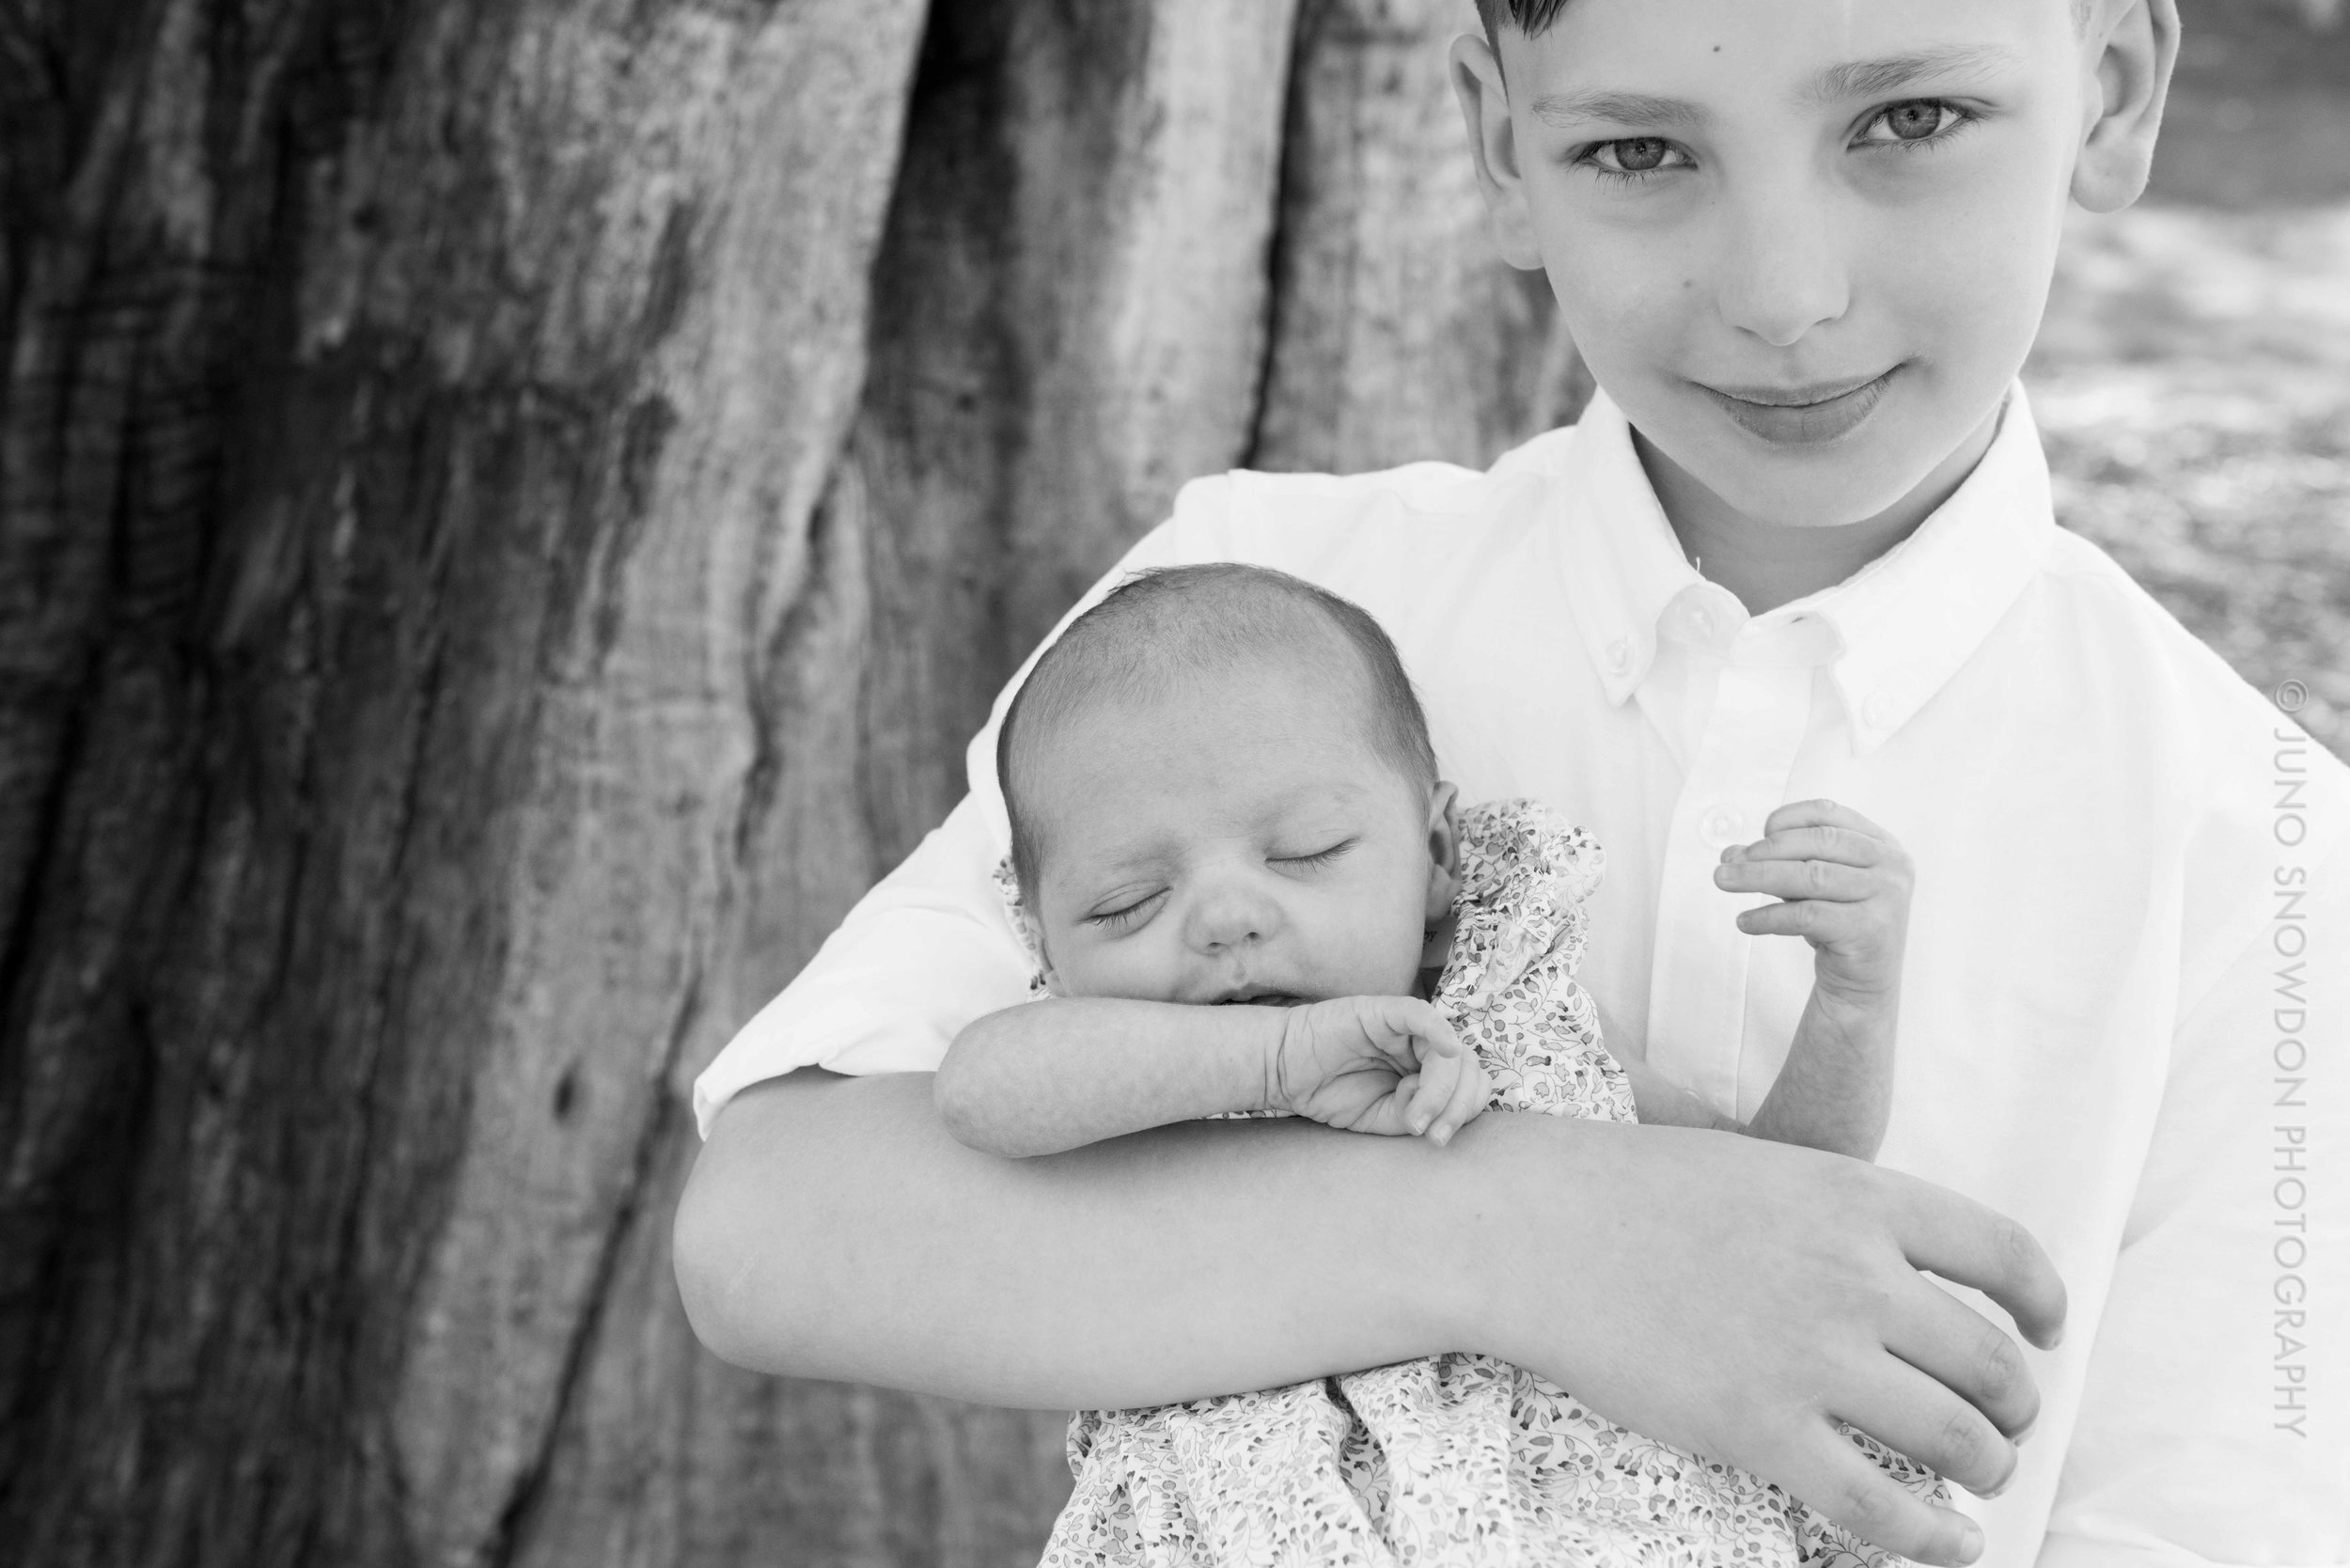 juno-snowdon-photography-newborn-5956.jpg